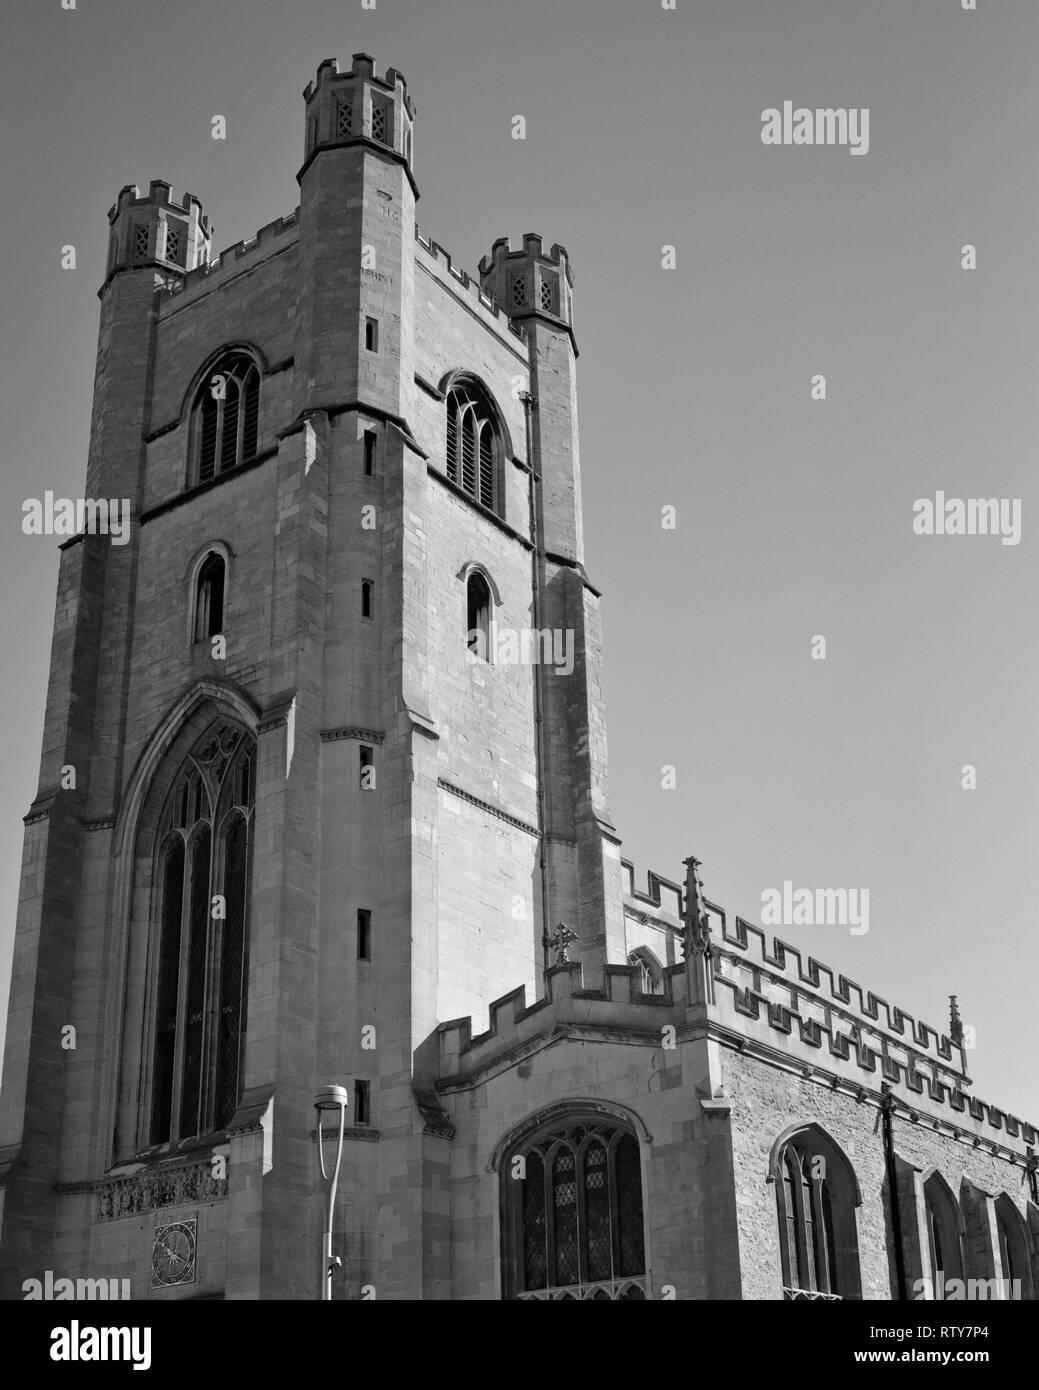 Great St Mary's Church King's Parade Cambridge England - Stock Image